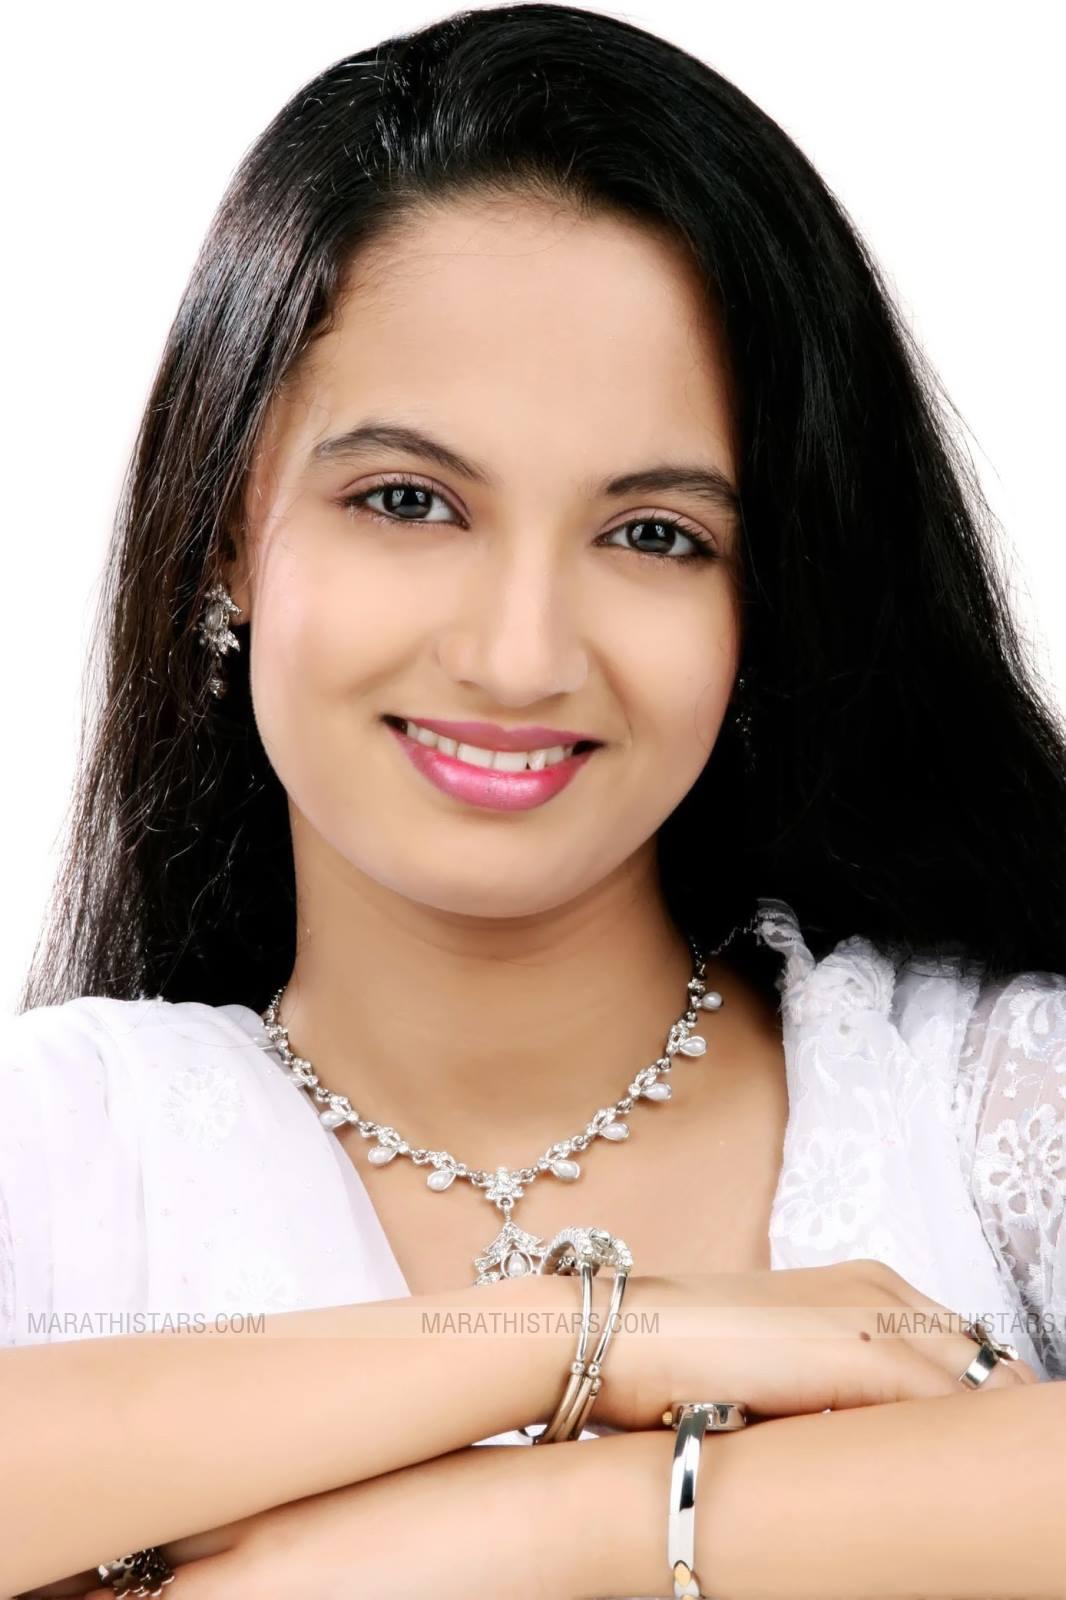 Ketaki Mategaonkar Marathi Actress Photos Biography Wiki -9206